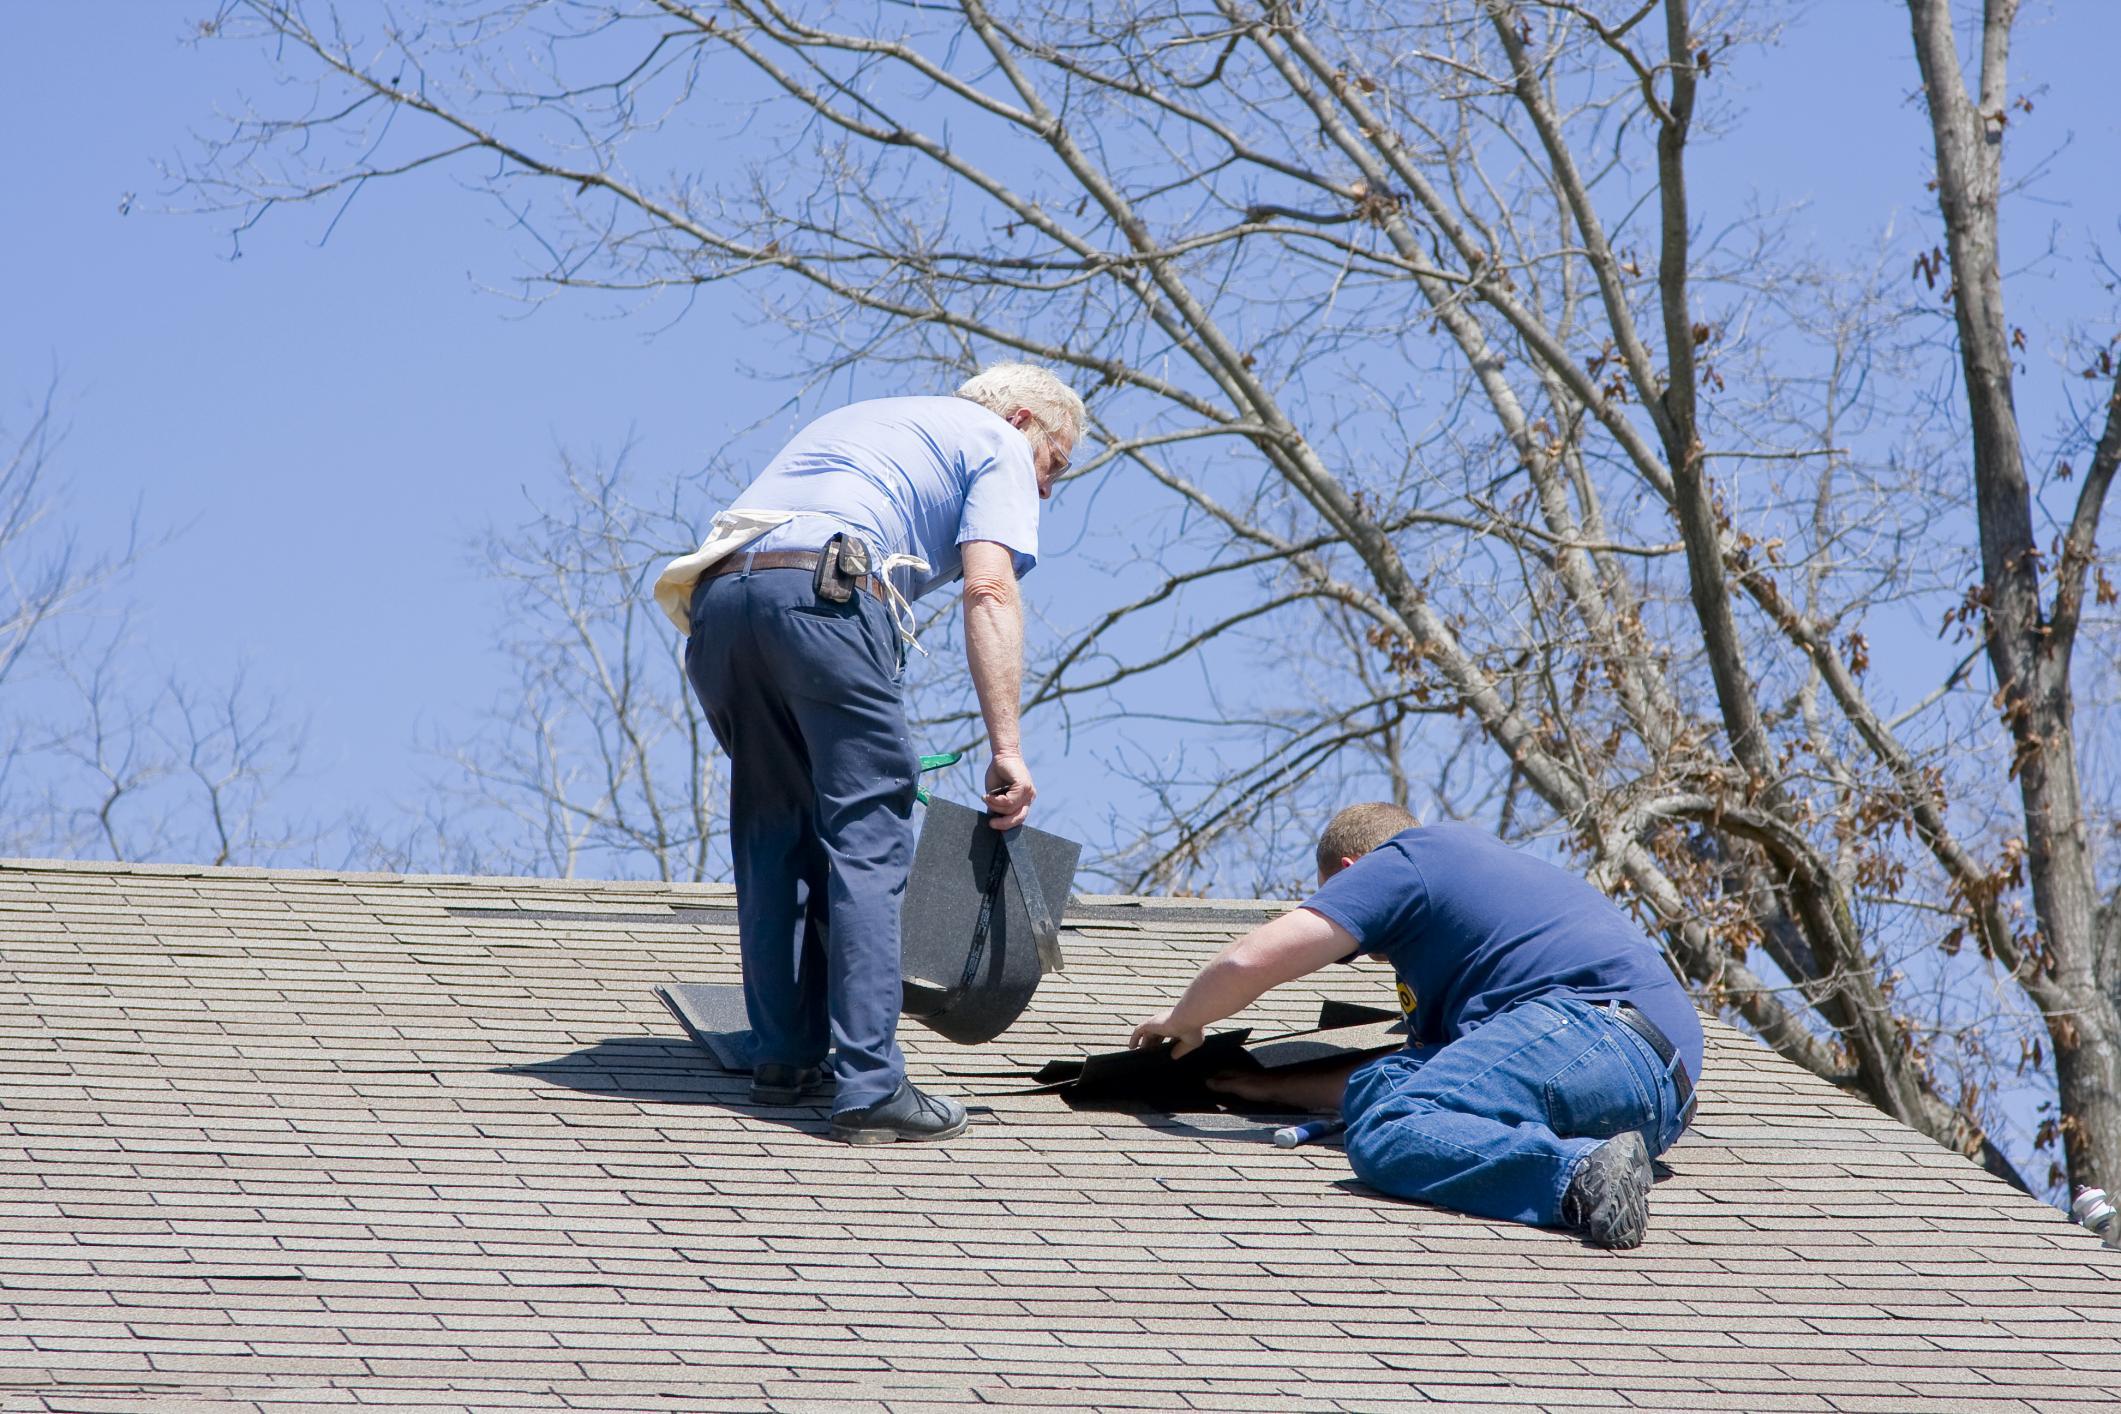 professional roofing contractors doing roof leaks repair